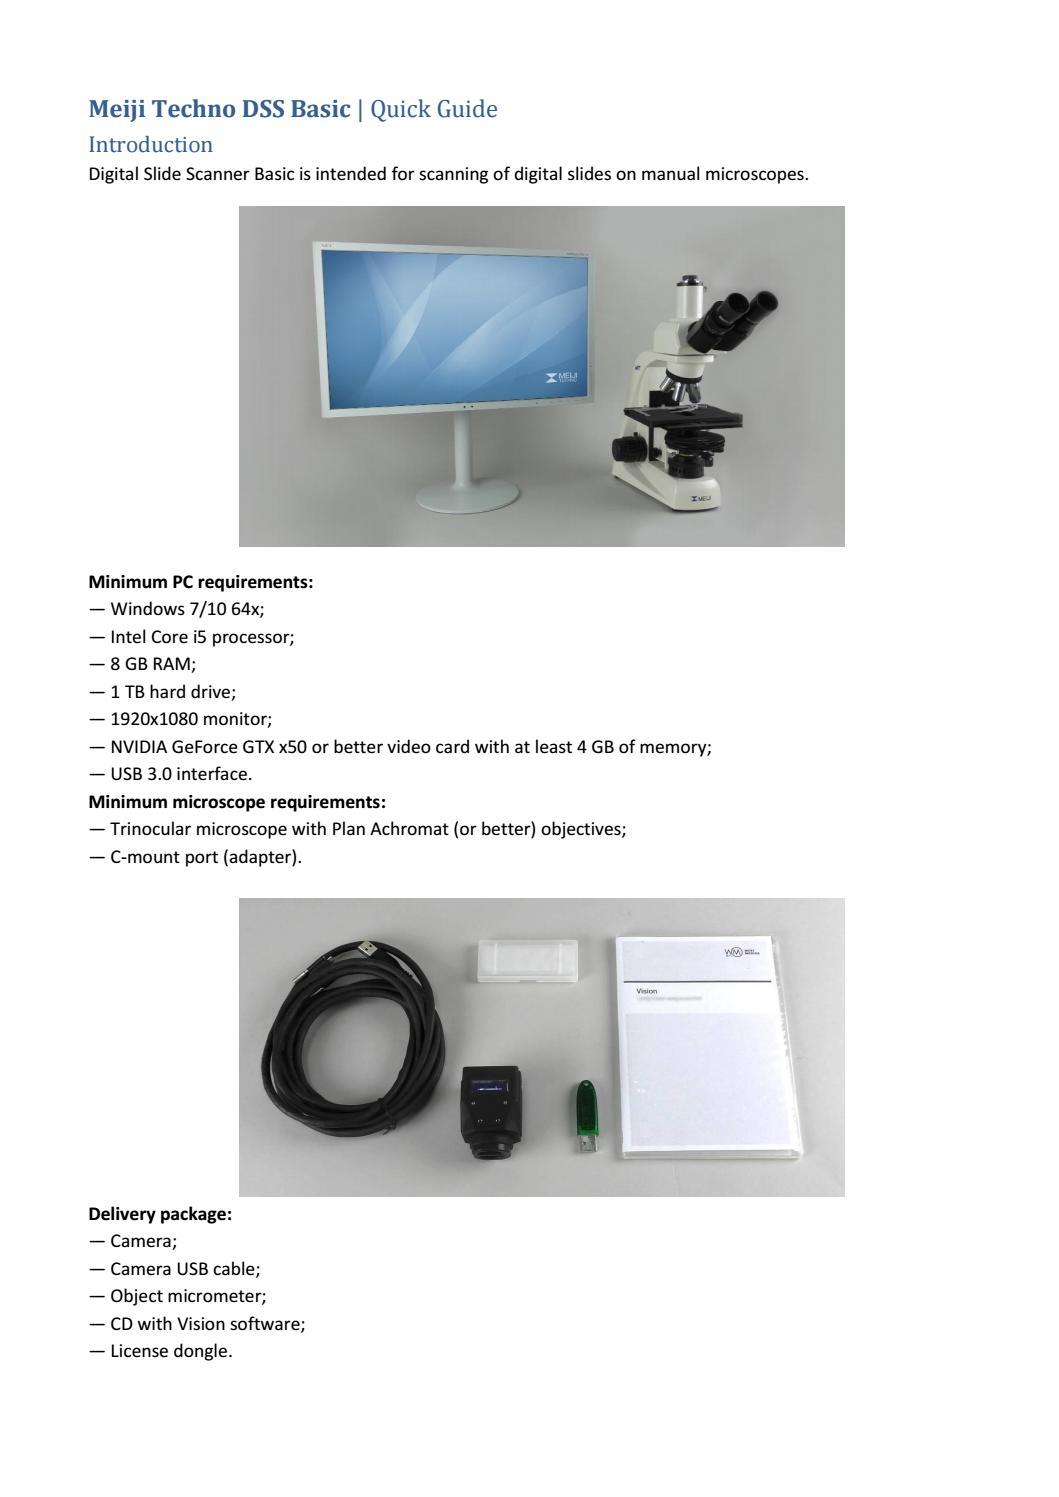 Meji Techno DSS Basic Start Guide by Meiji Techno America - issuu